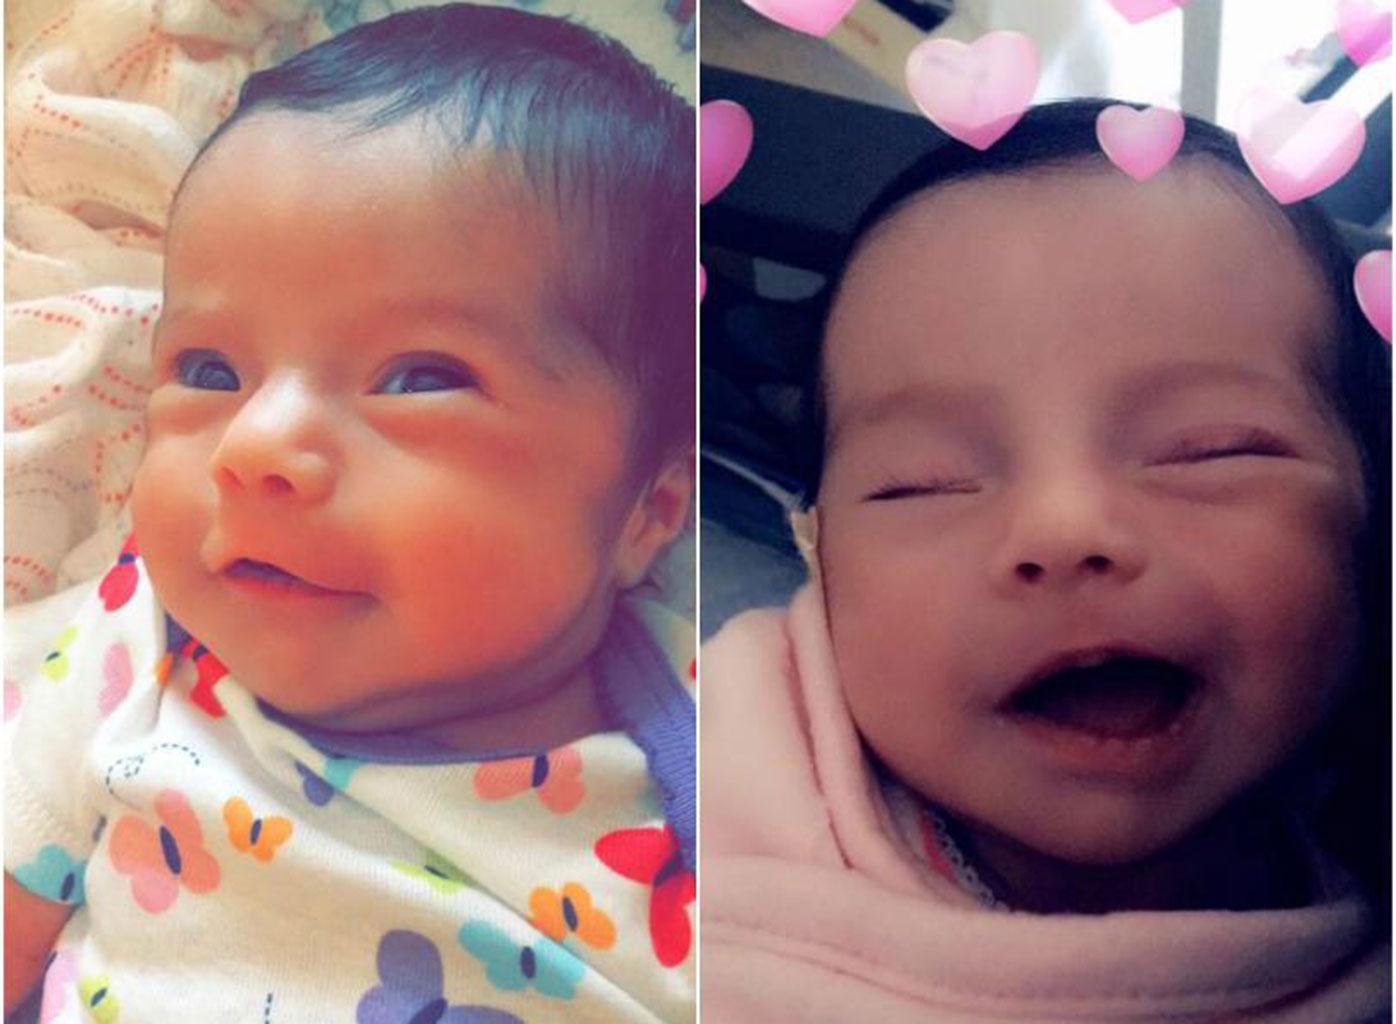 Newborn is child of Savanna Greywind, slain woman who vanished while pregnant